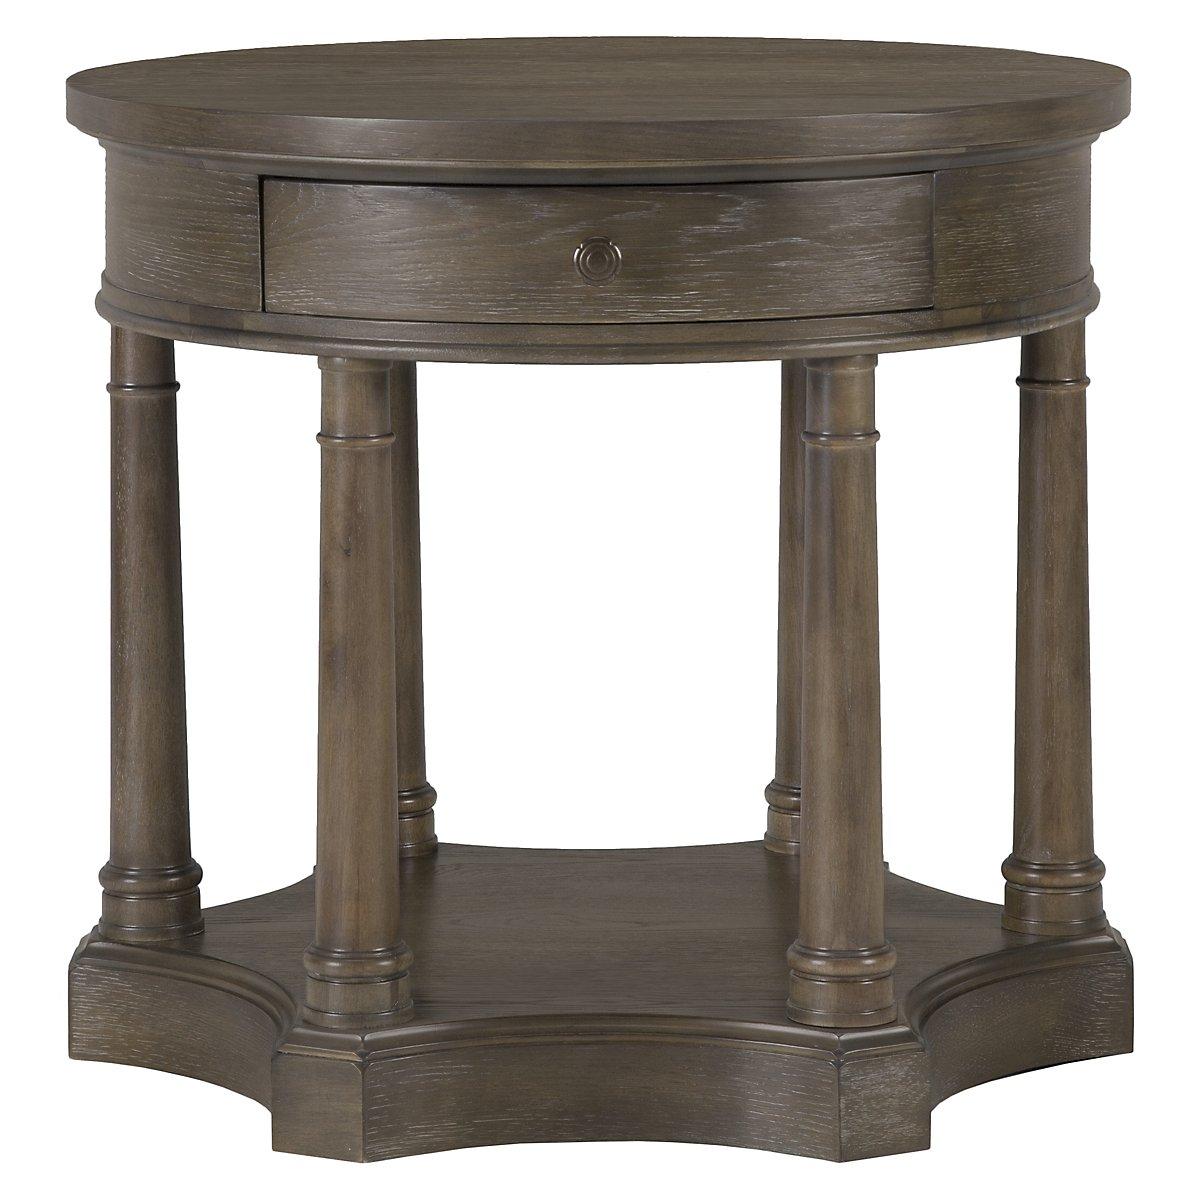 Belgian Oak Light Tone Wood Round End Table